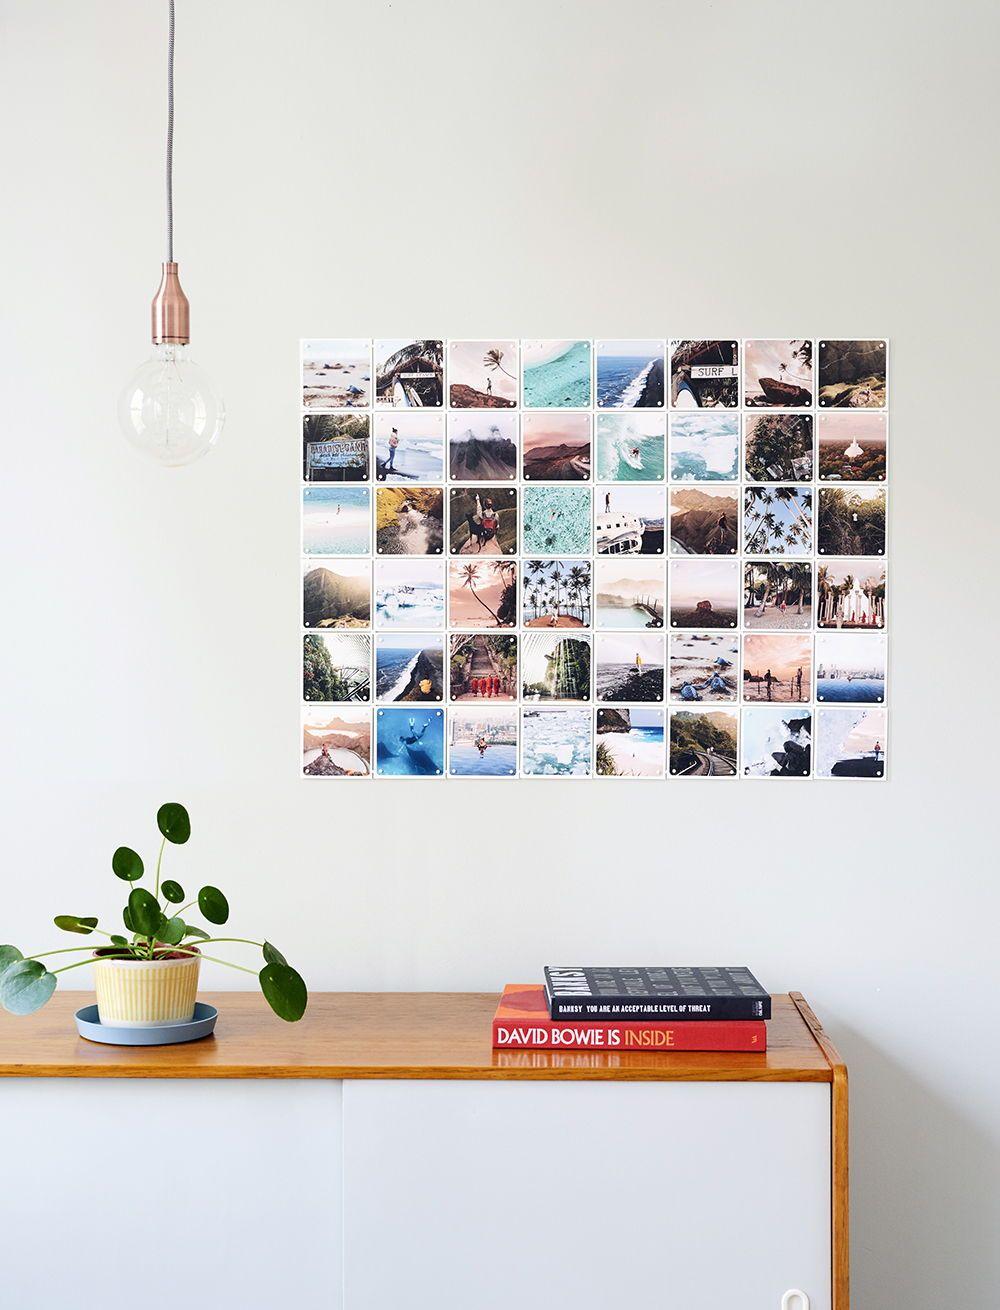 Personal photo wall | Source: ixxiyourworld.com